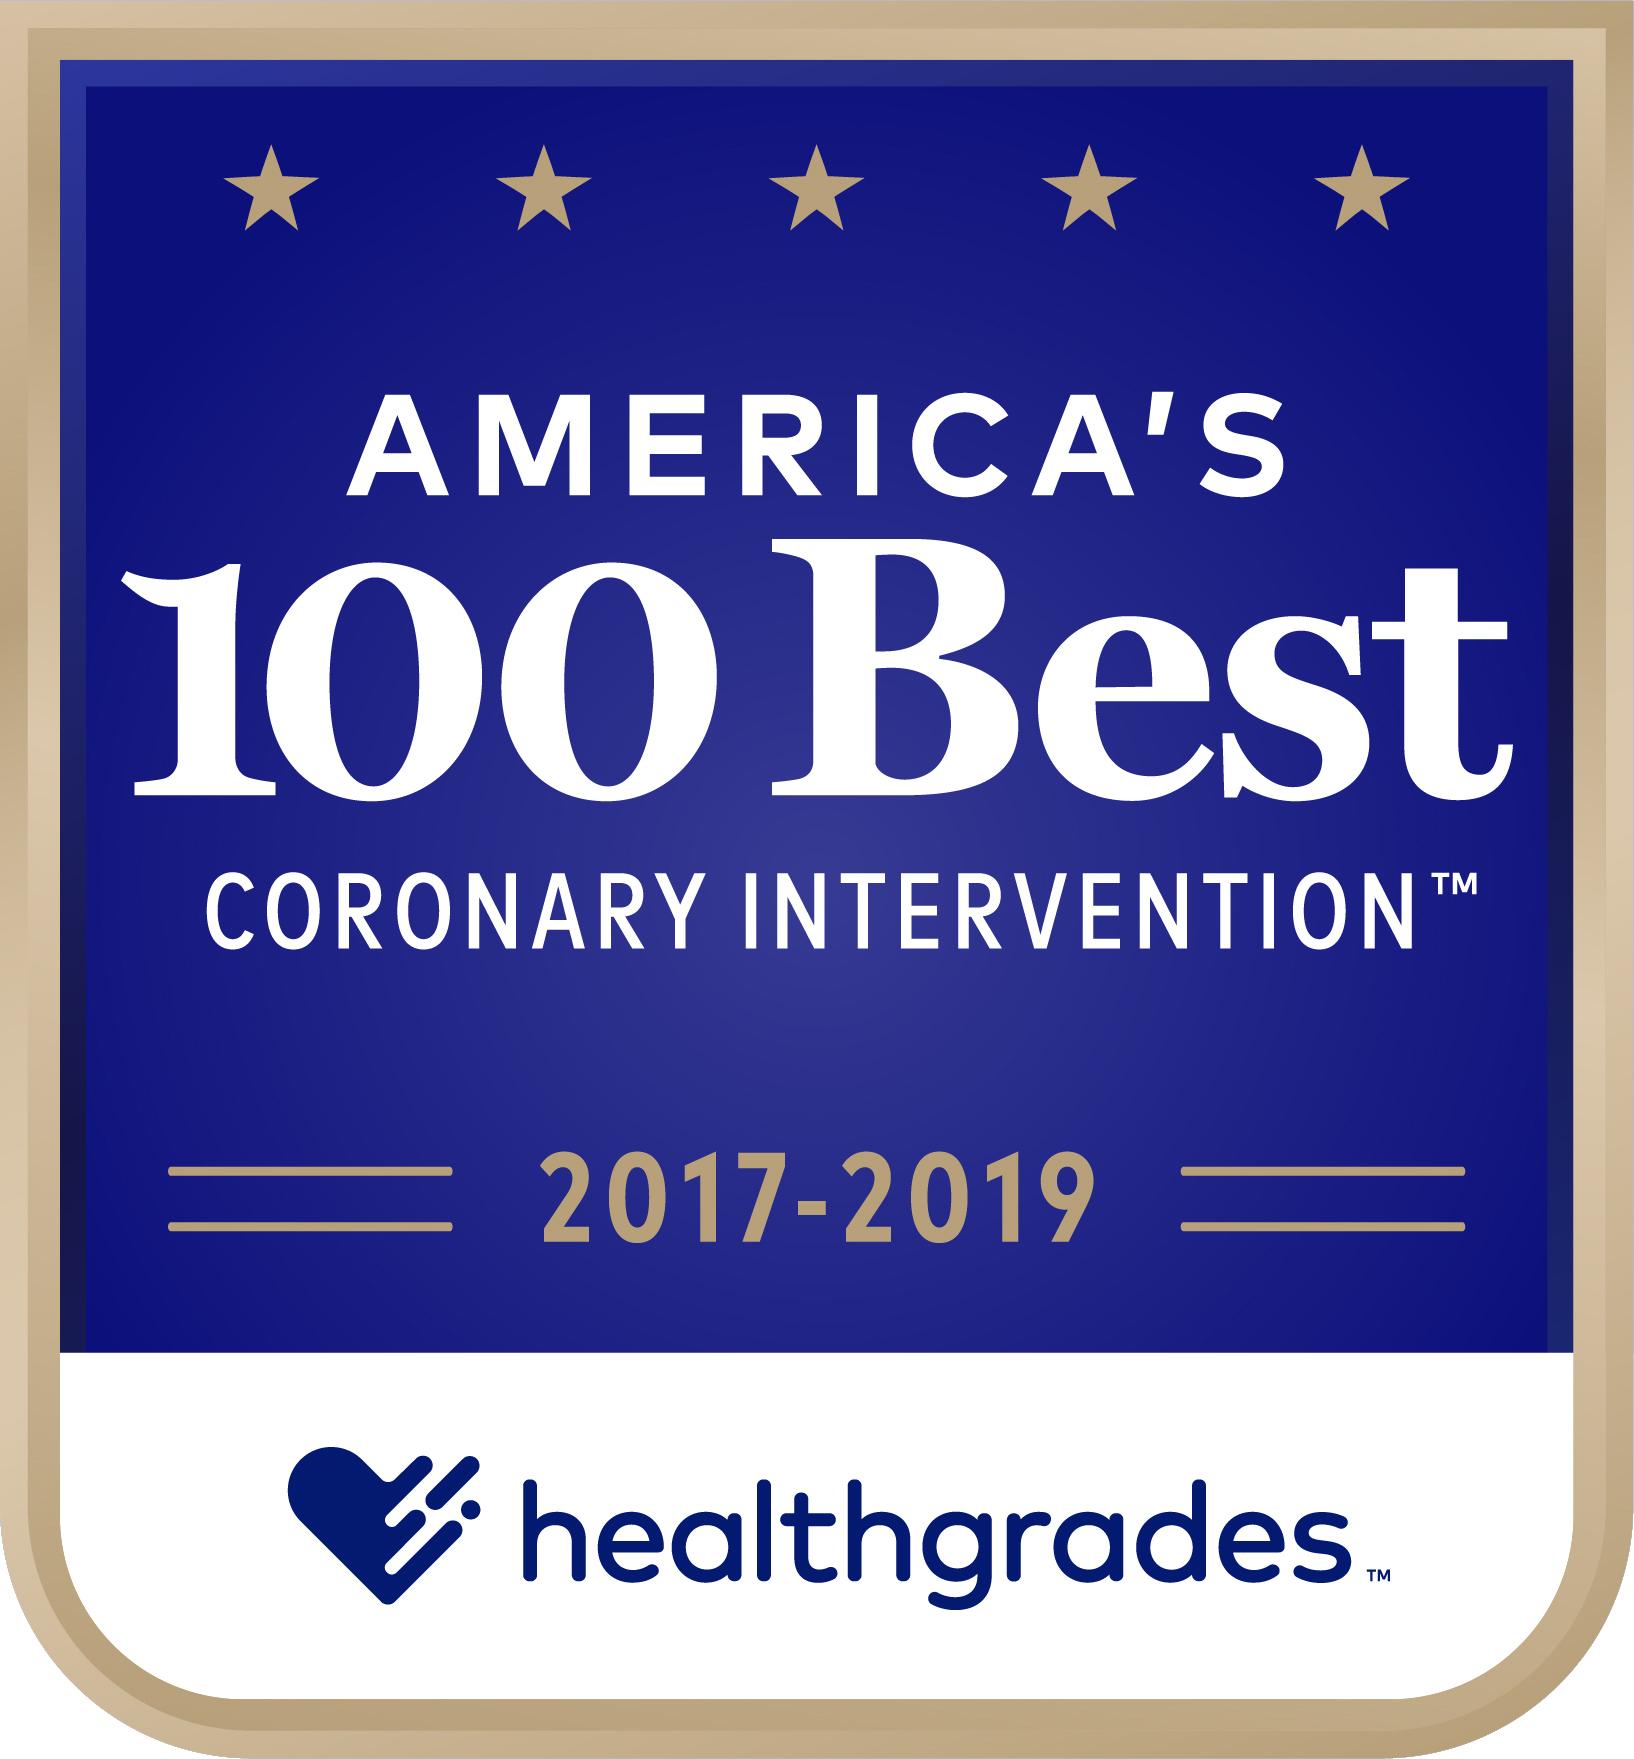 healthgrades award